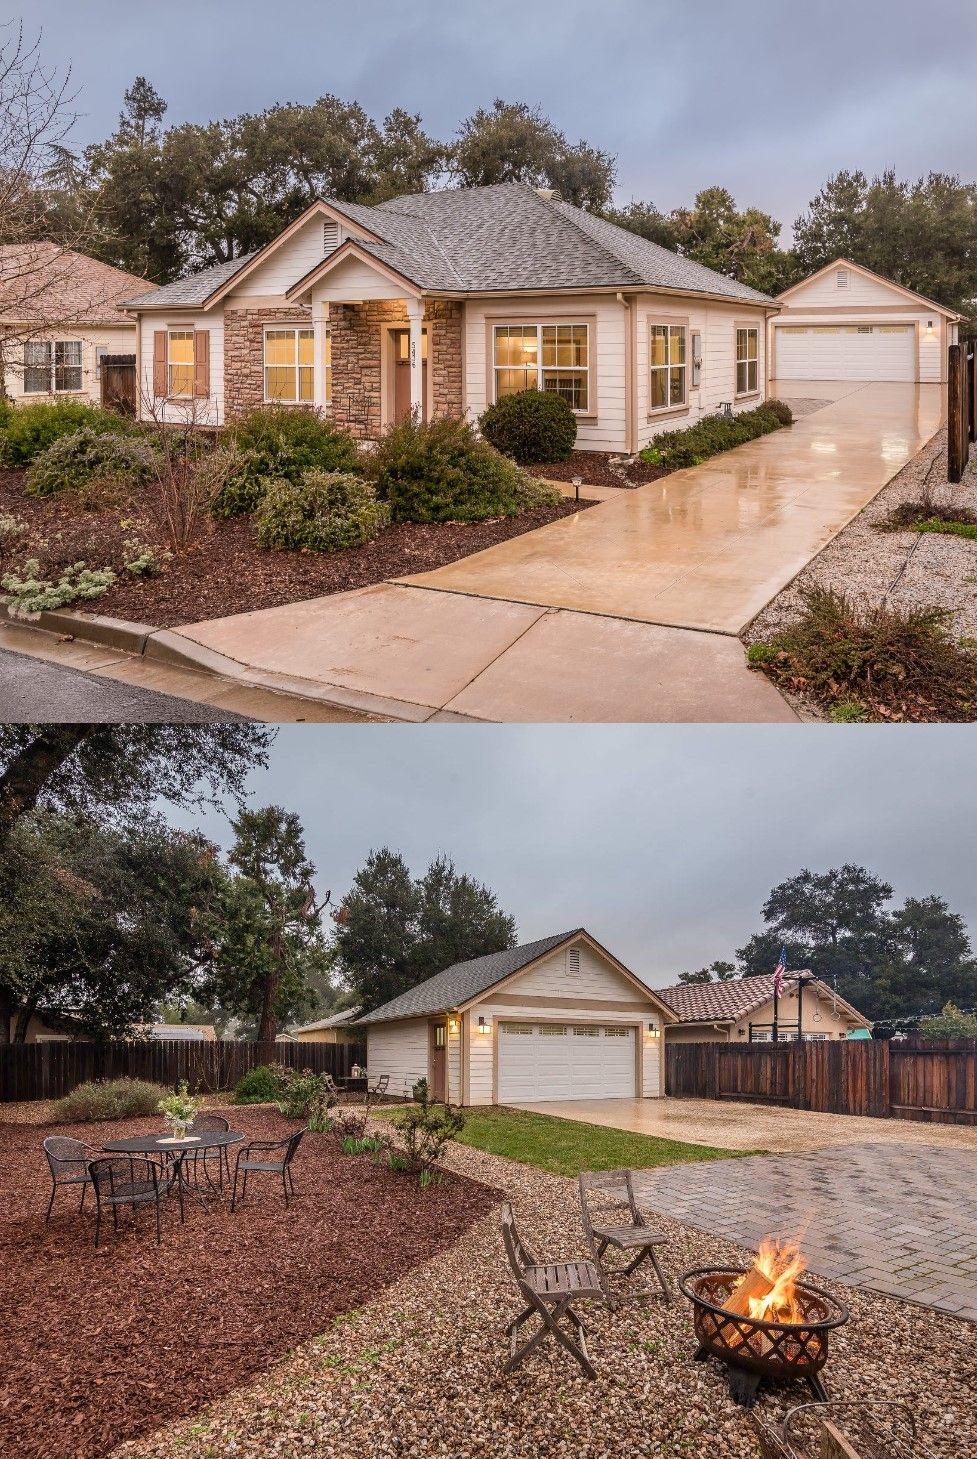 Atascadero Home For Sale Central Coast Real Estate Paso Robles